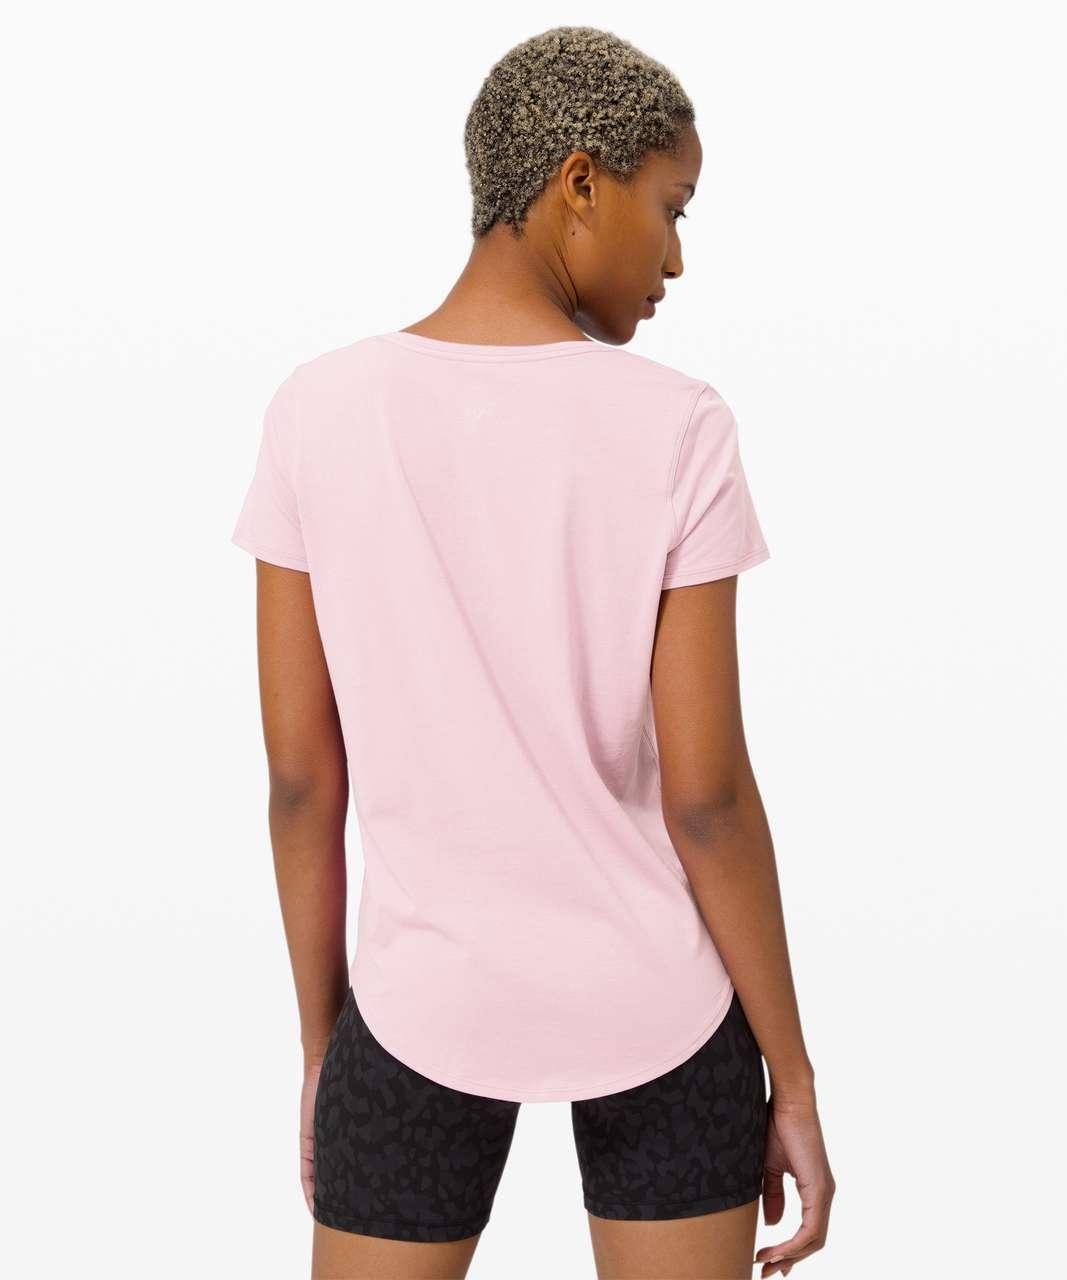 Lululemon Love Tee V - Misty Pink